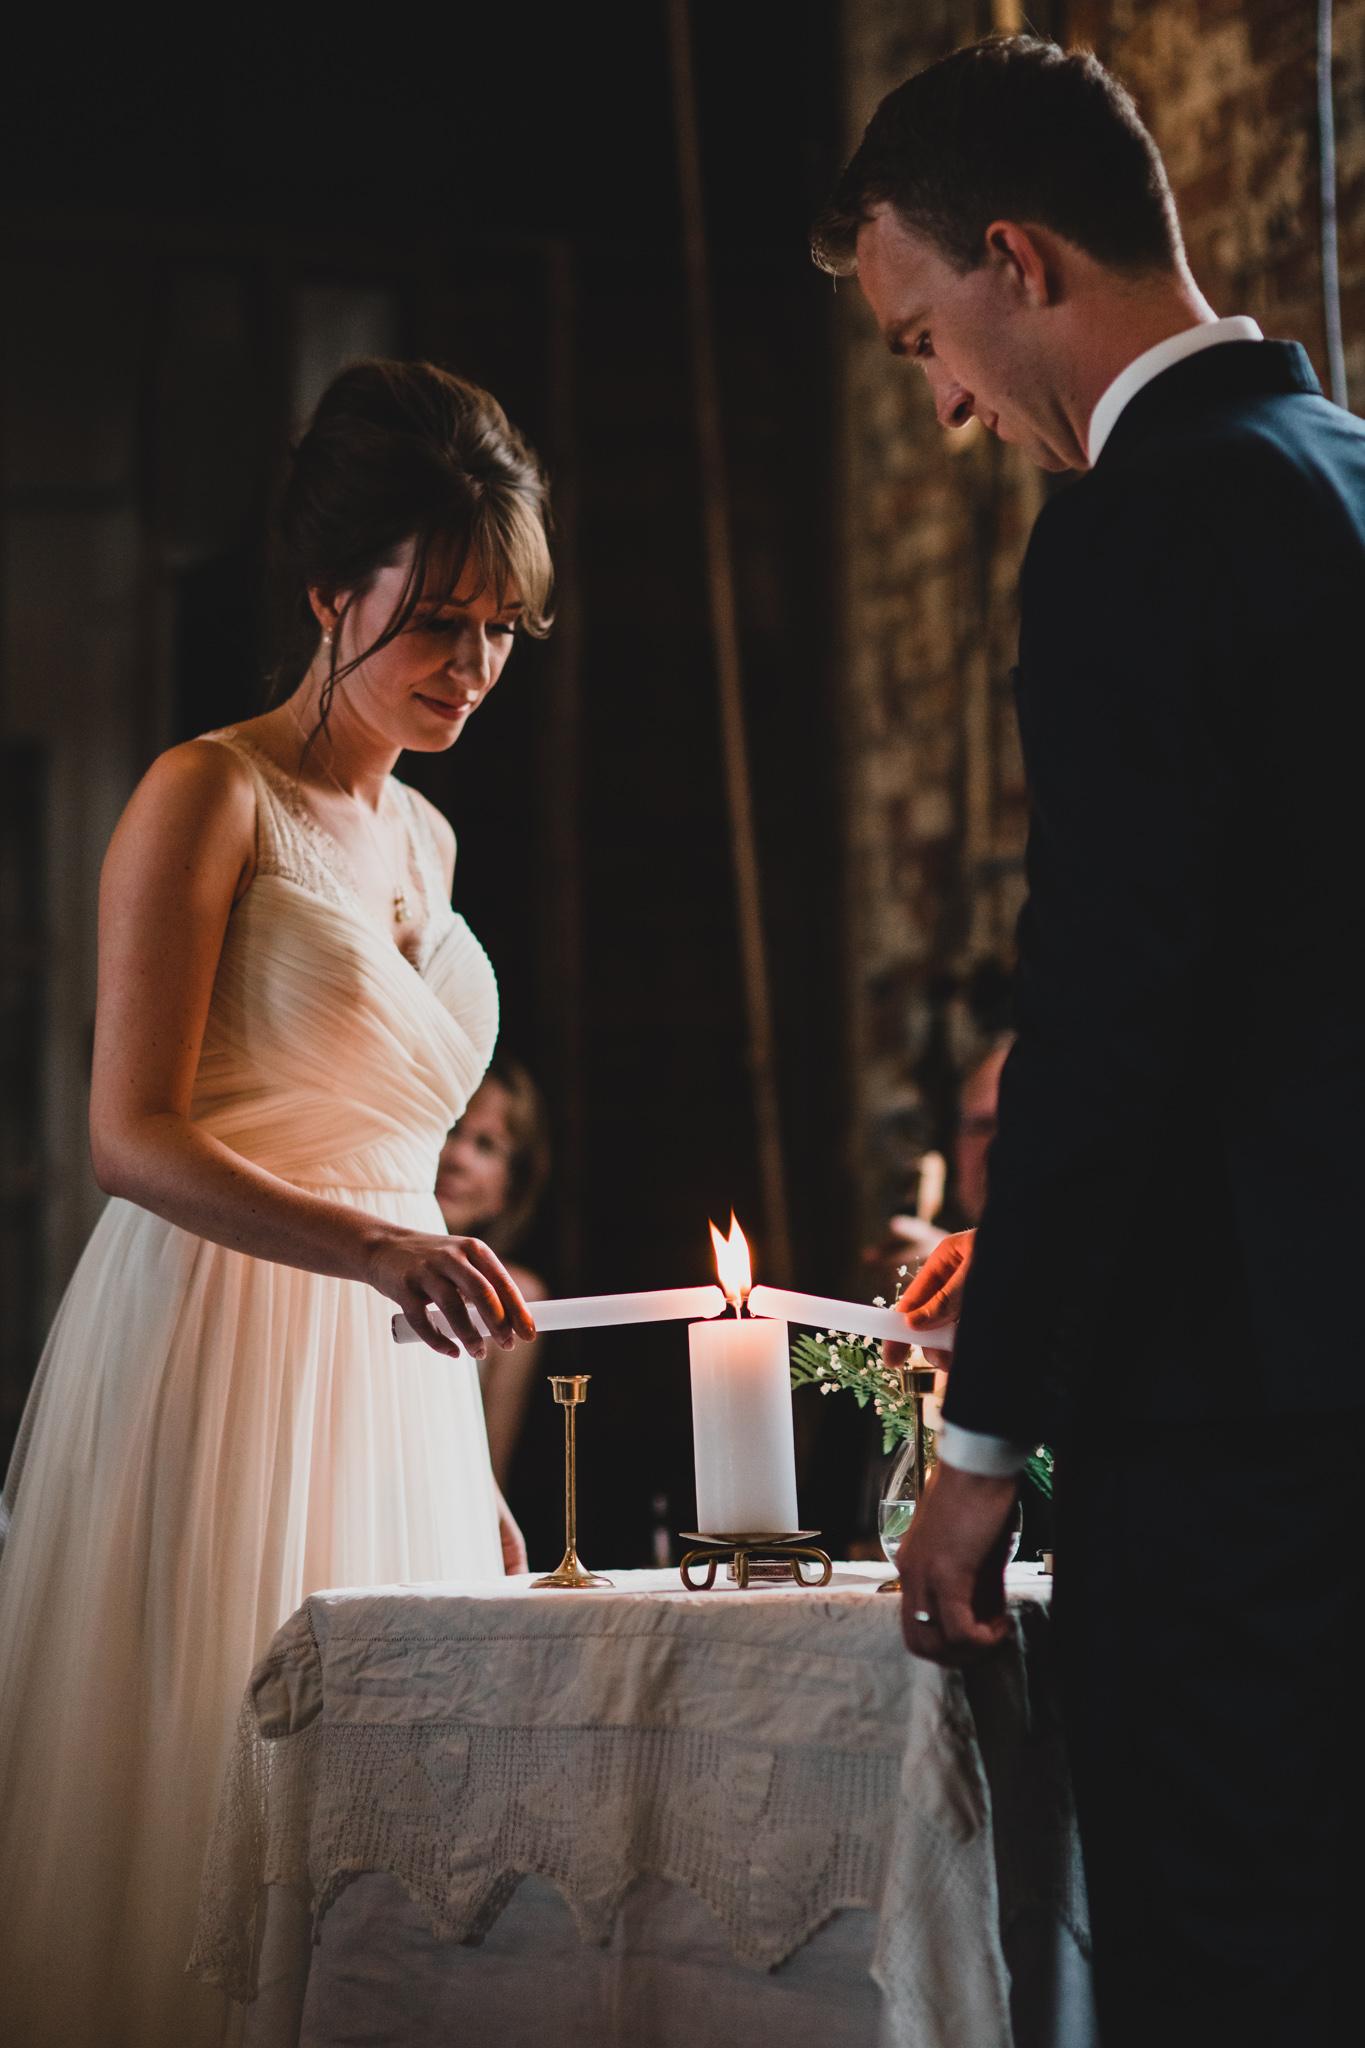 349-WEB-Jonathan-Kuhn-Photography-ClareConor-Wedding-7027.jpg